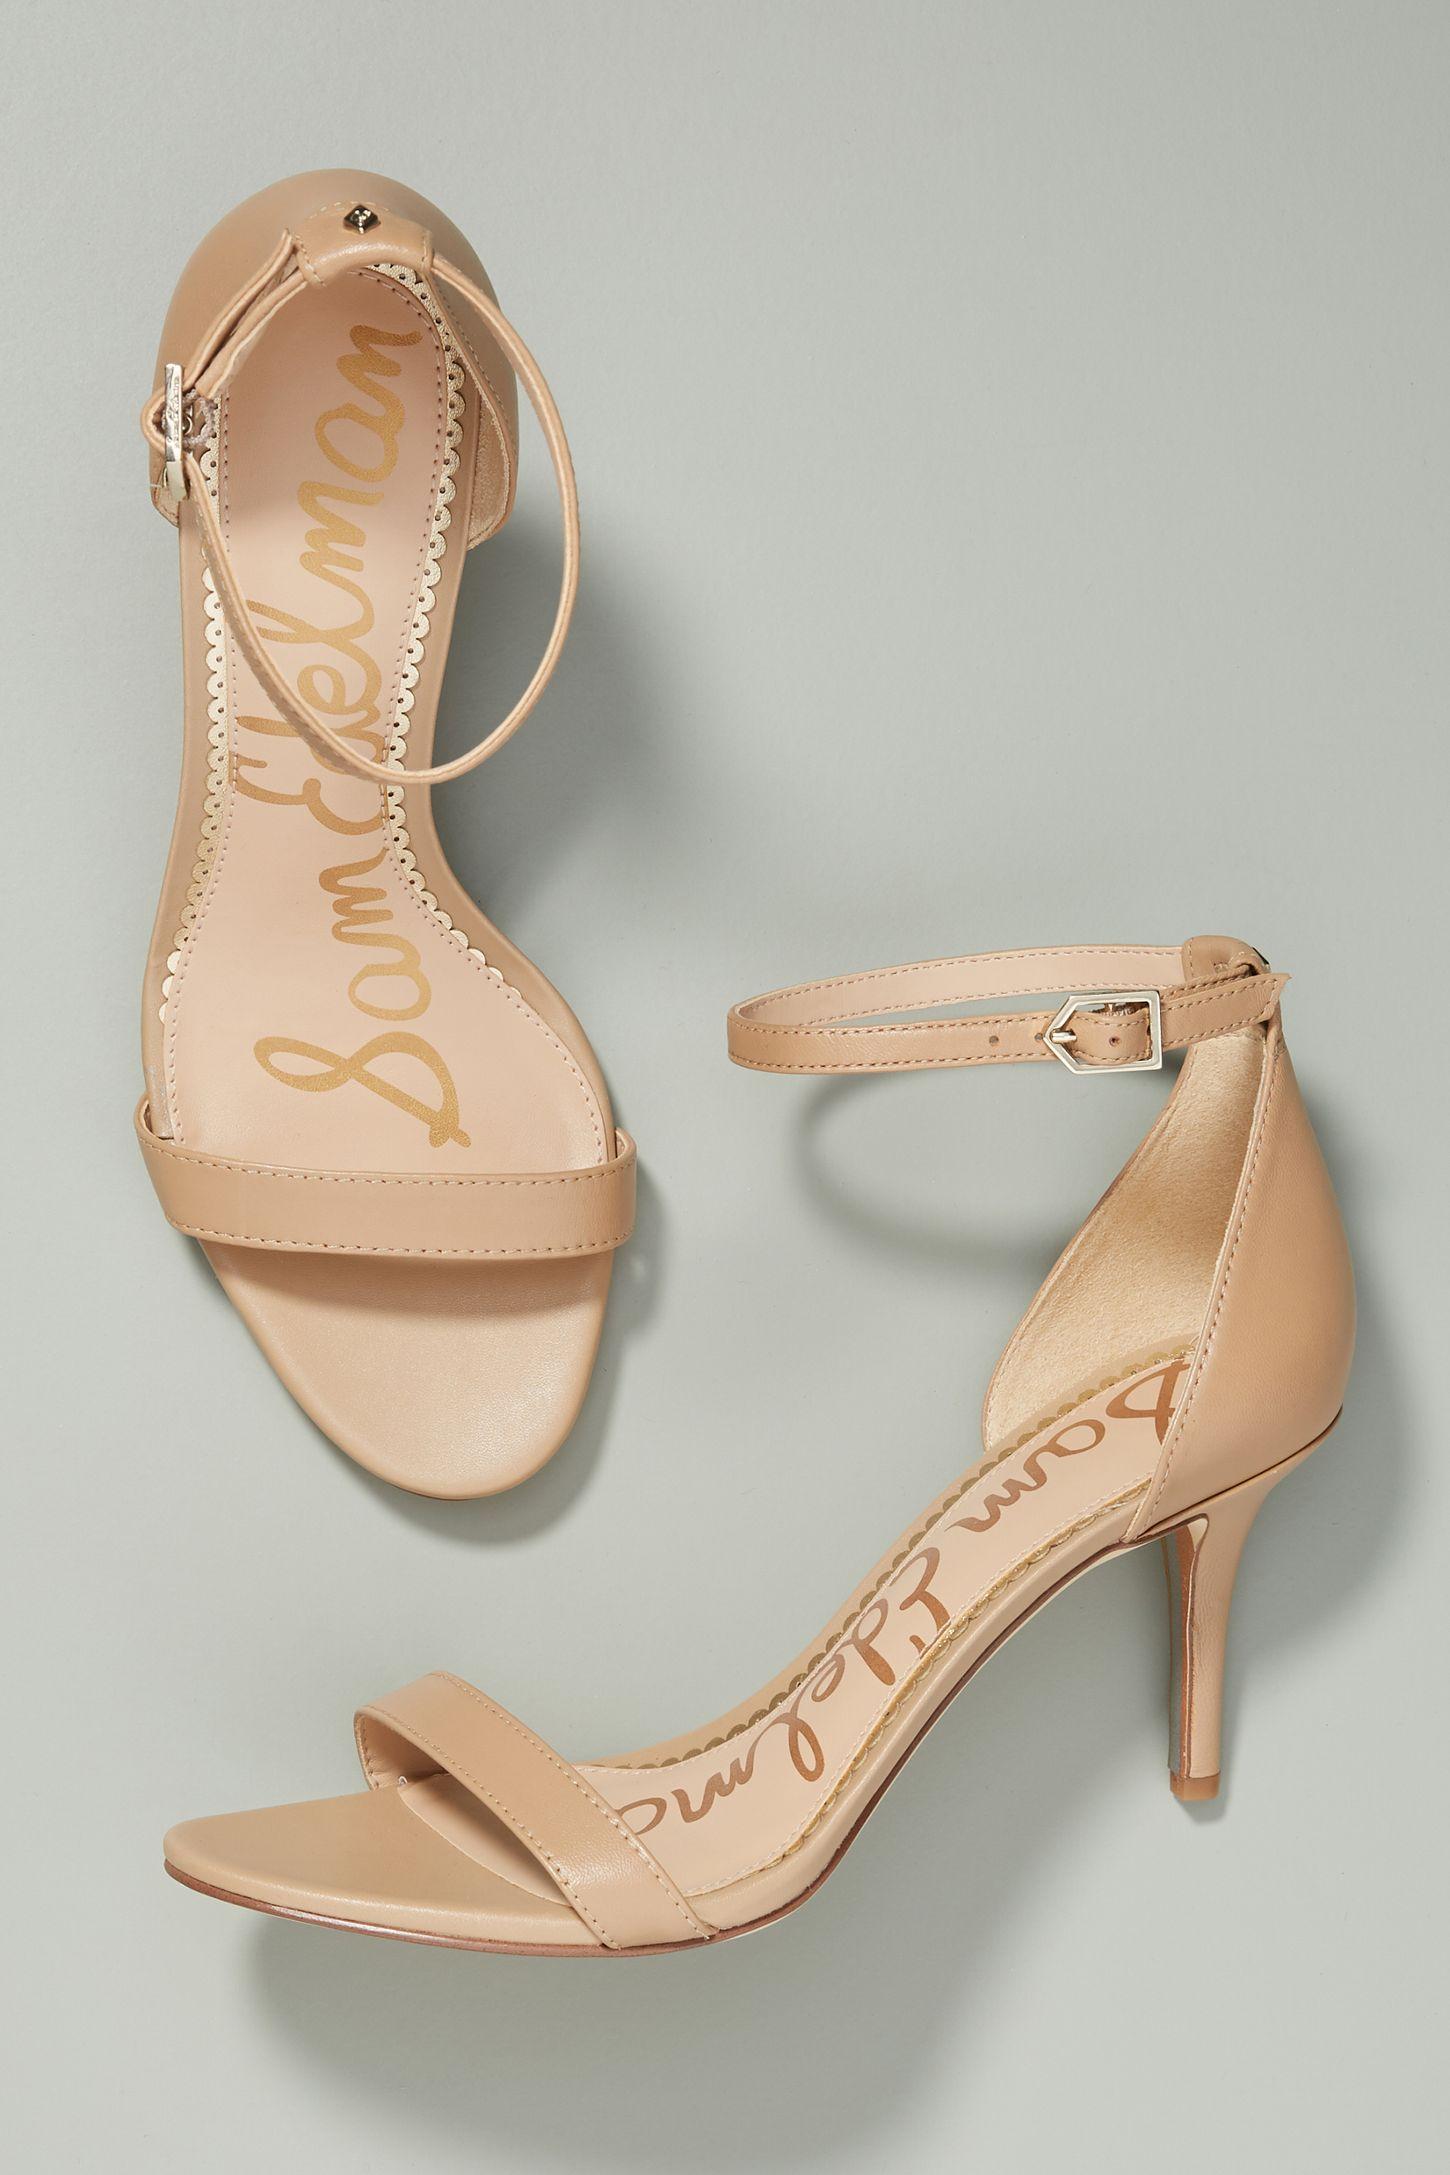 d0489e8a5706 Sam Edelman Patti Heeled Sandals